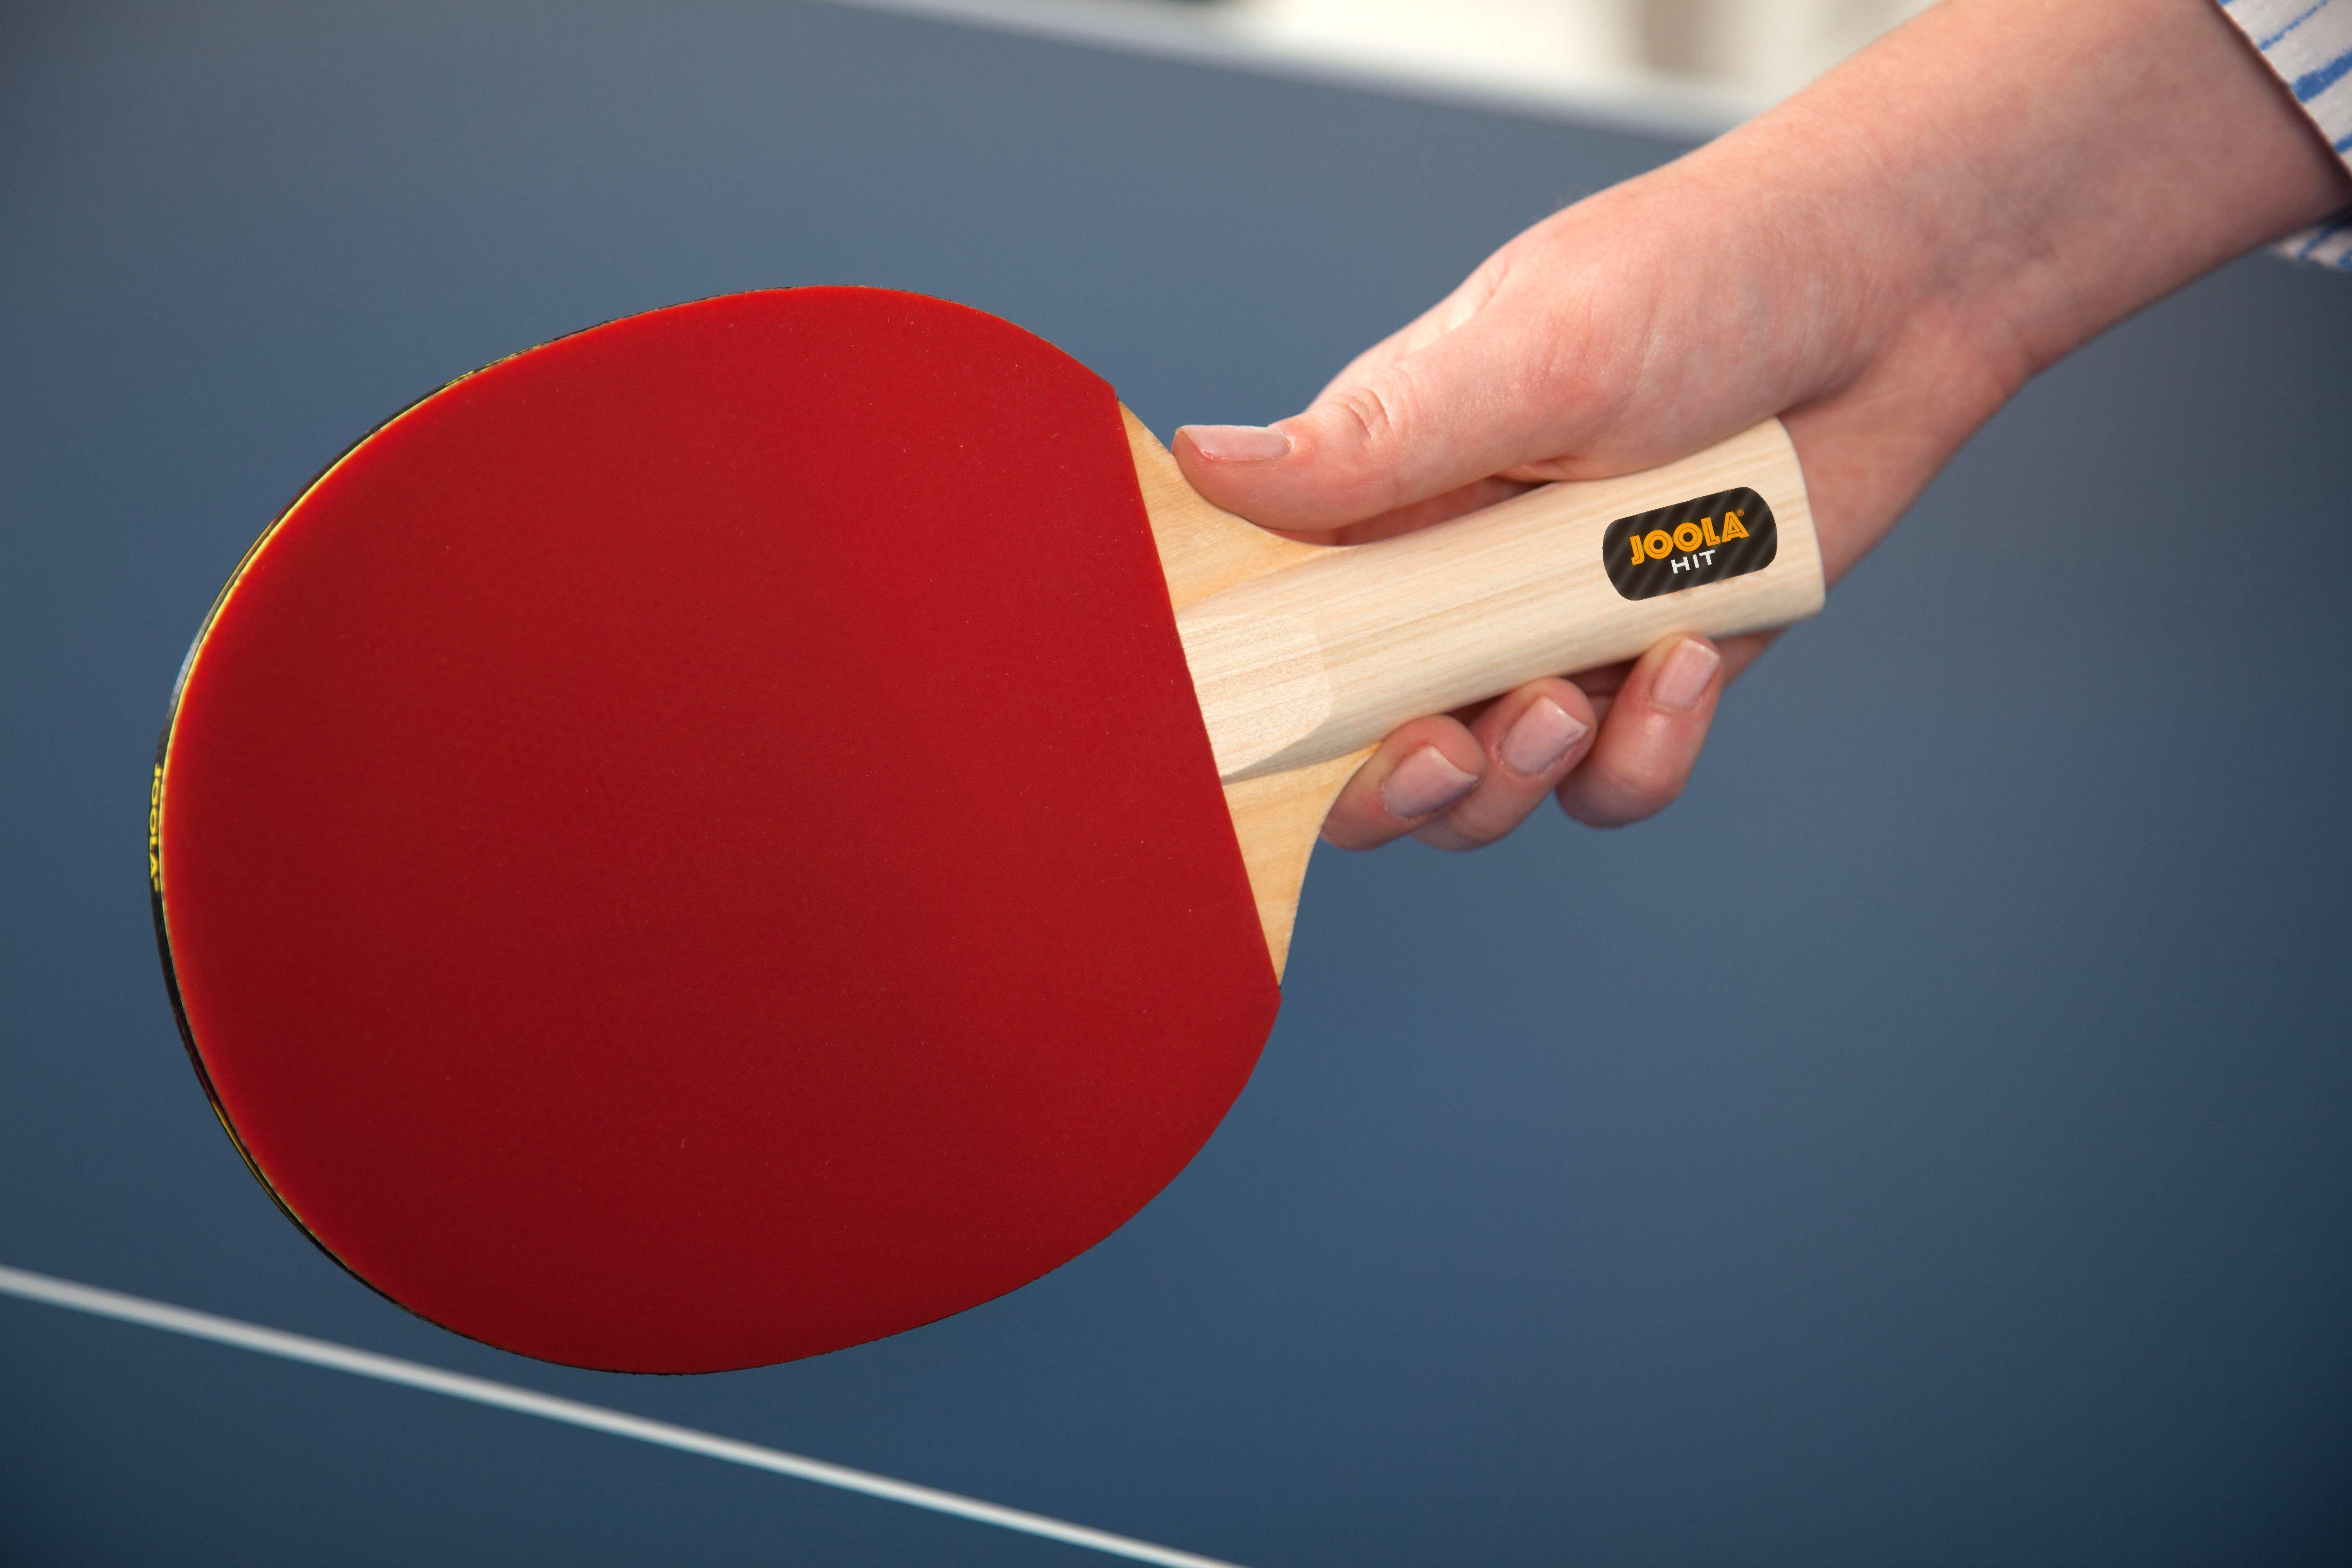 Joola Hit Table Tennis Set Includes 4 Hit Rackets 8 Balls Carrying Case Msrp 44 95 Joola Table Tennis Set Tennis Games Table Tennis